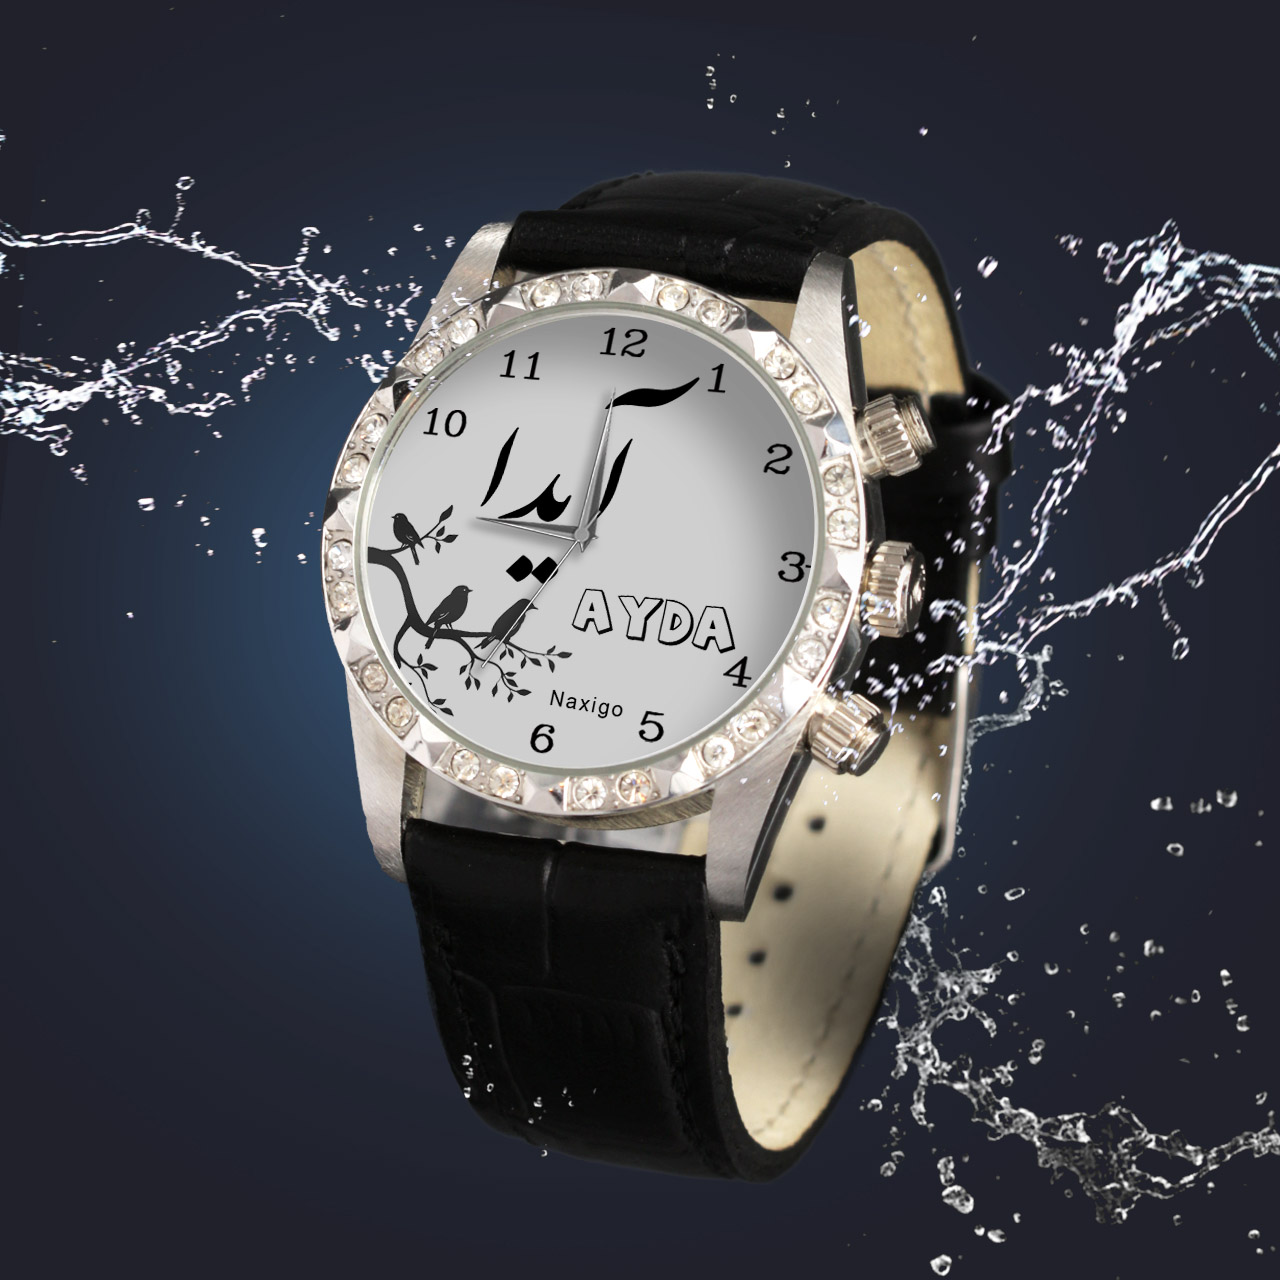 خرید و قیمت                      ساعت مچی  زنانه ناکسیگو طرح آیدا کد LS3781